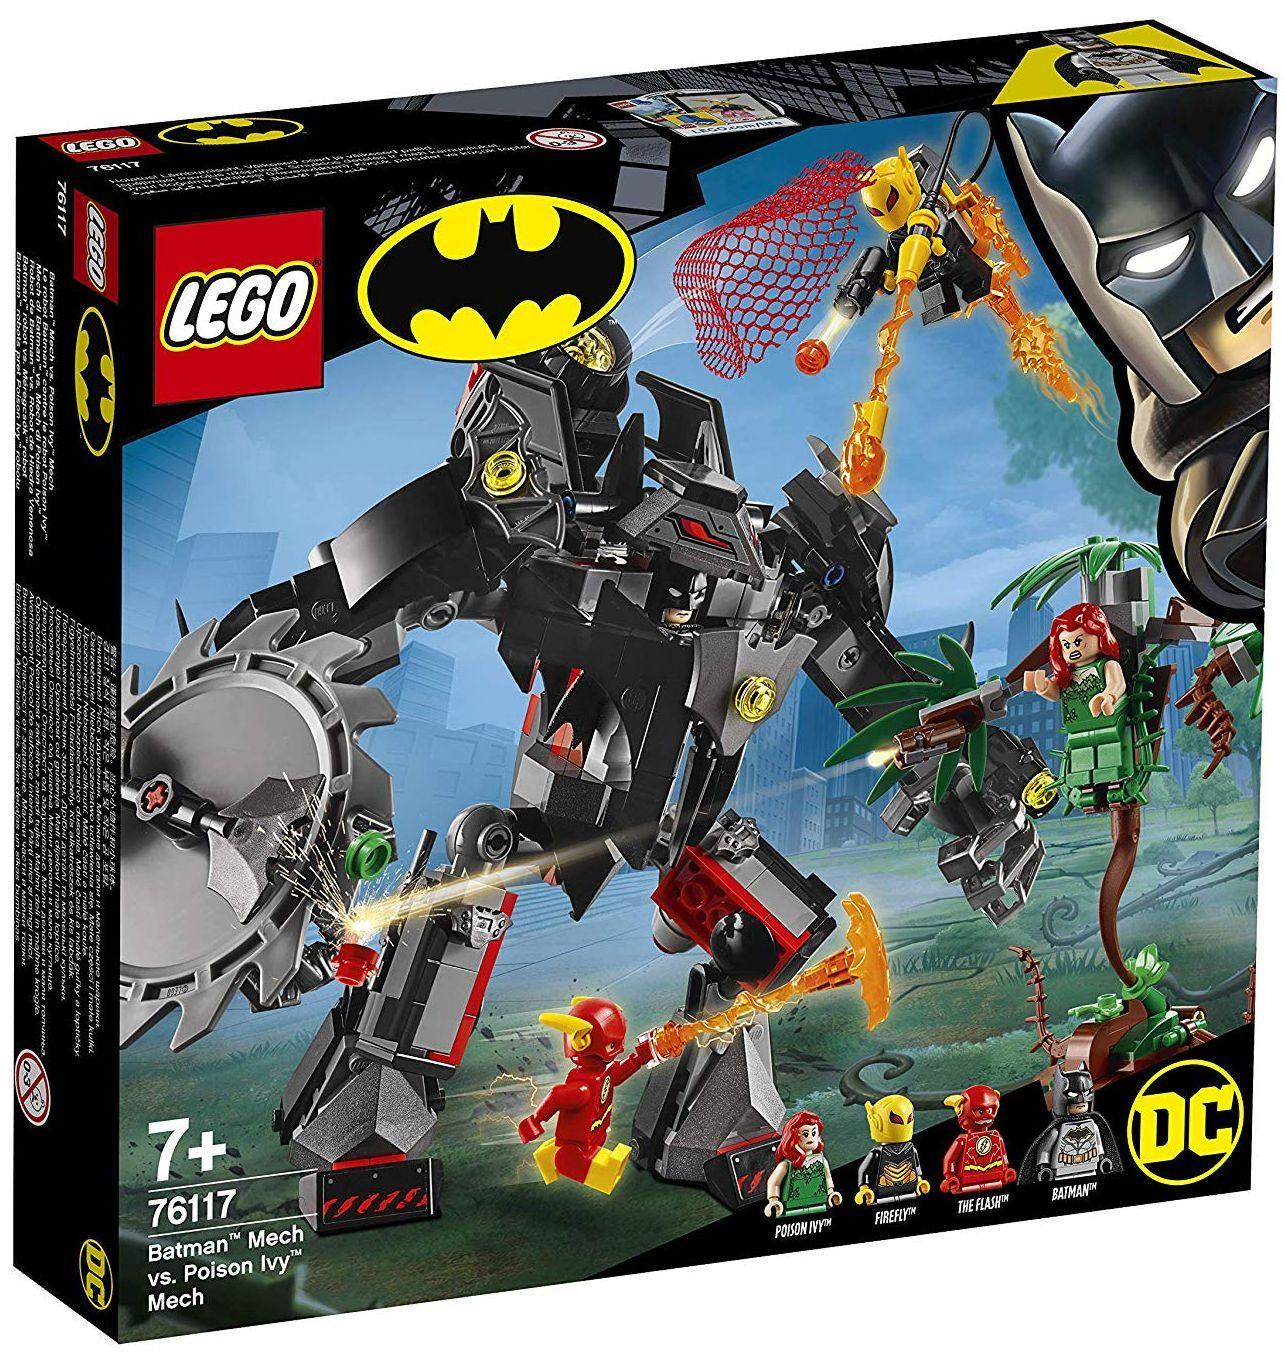 Конструктор Lego DC Super Heroes - Batman Mech vs. Poison Ivy Mech (76117) - 10